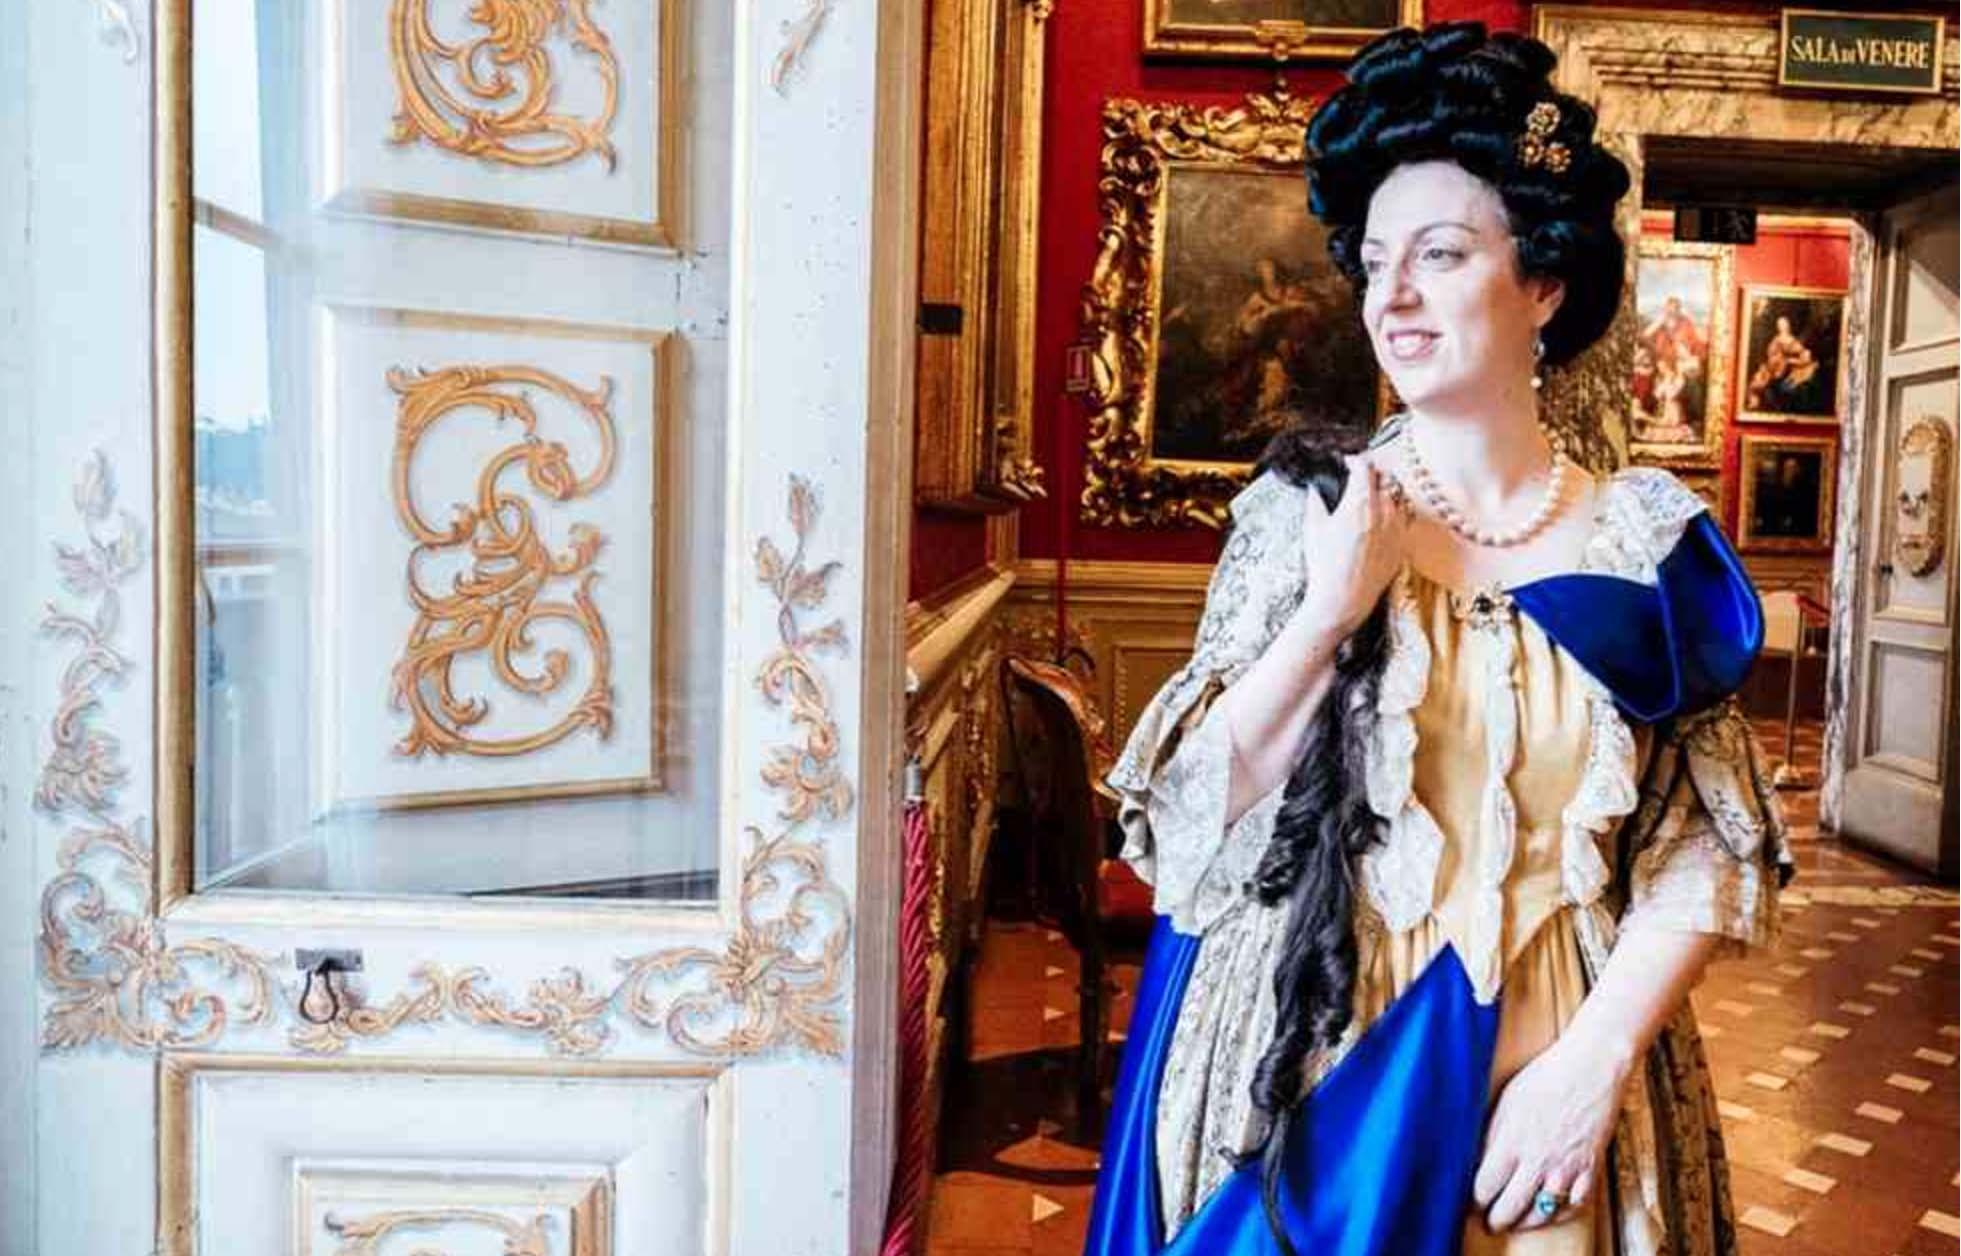 Actress playing Anna Maria Luisa de' Medici at Palazzo Pitti